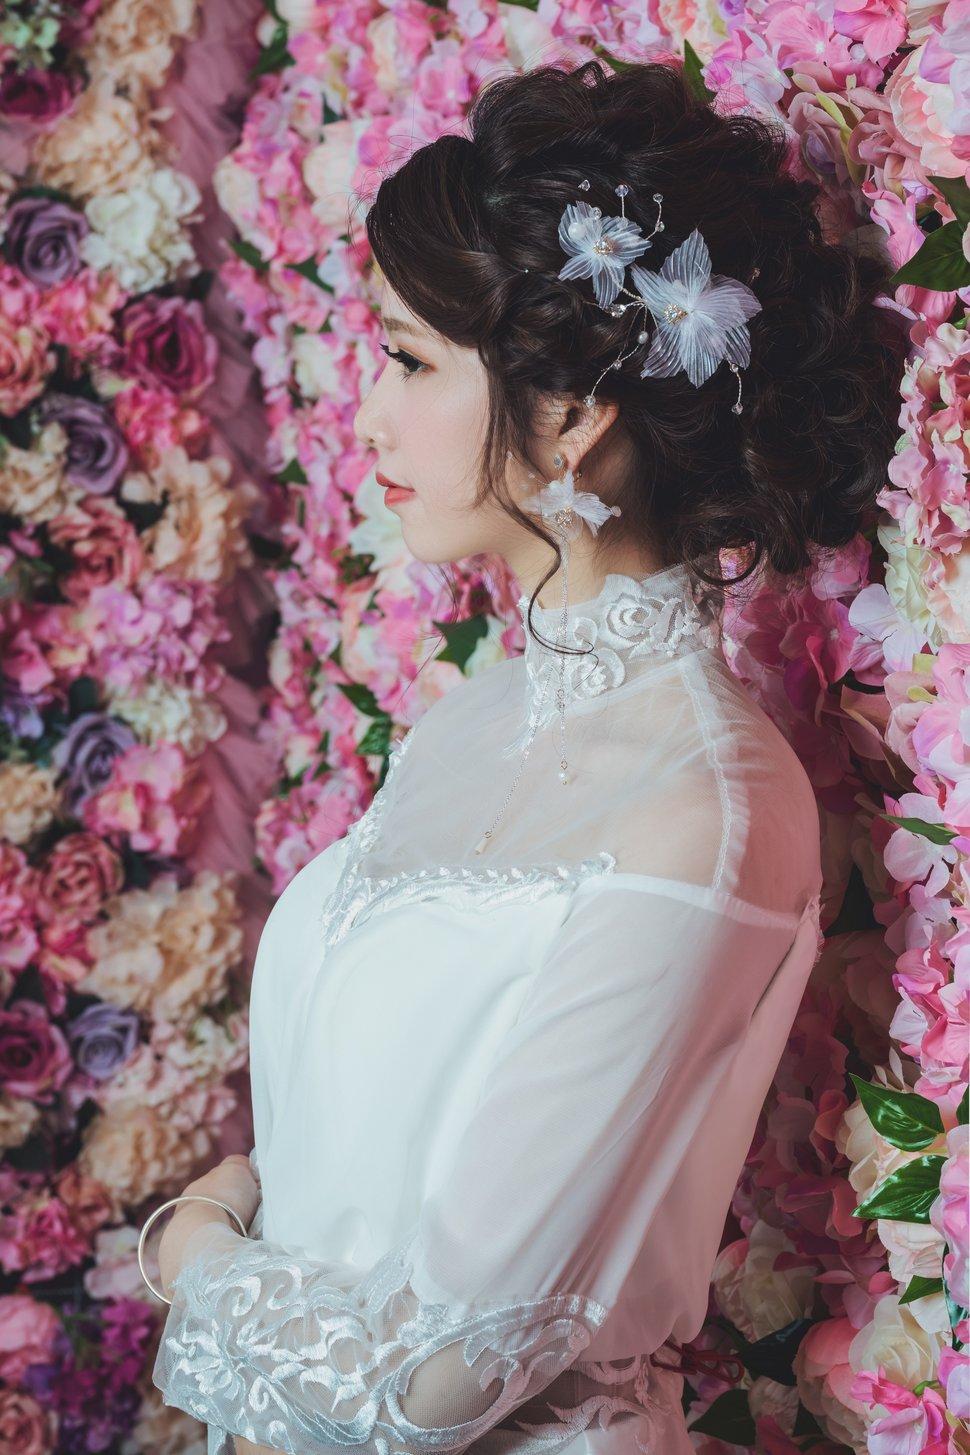 5D4_0647 - Promaker婚禮紀錄攝影團隊婚攝豪哥《結婚吧》